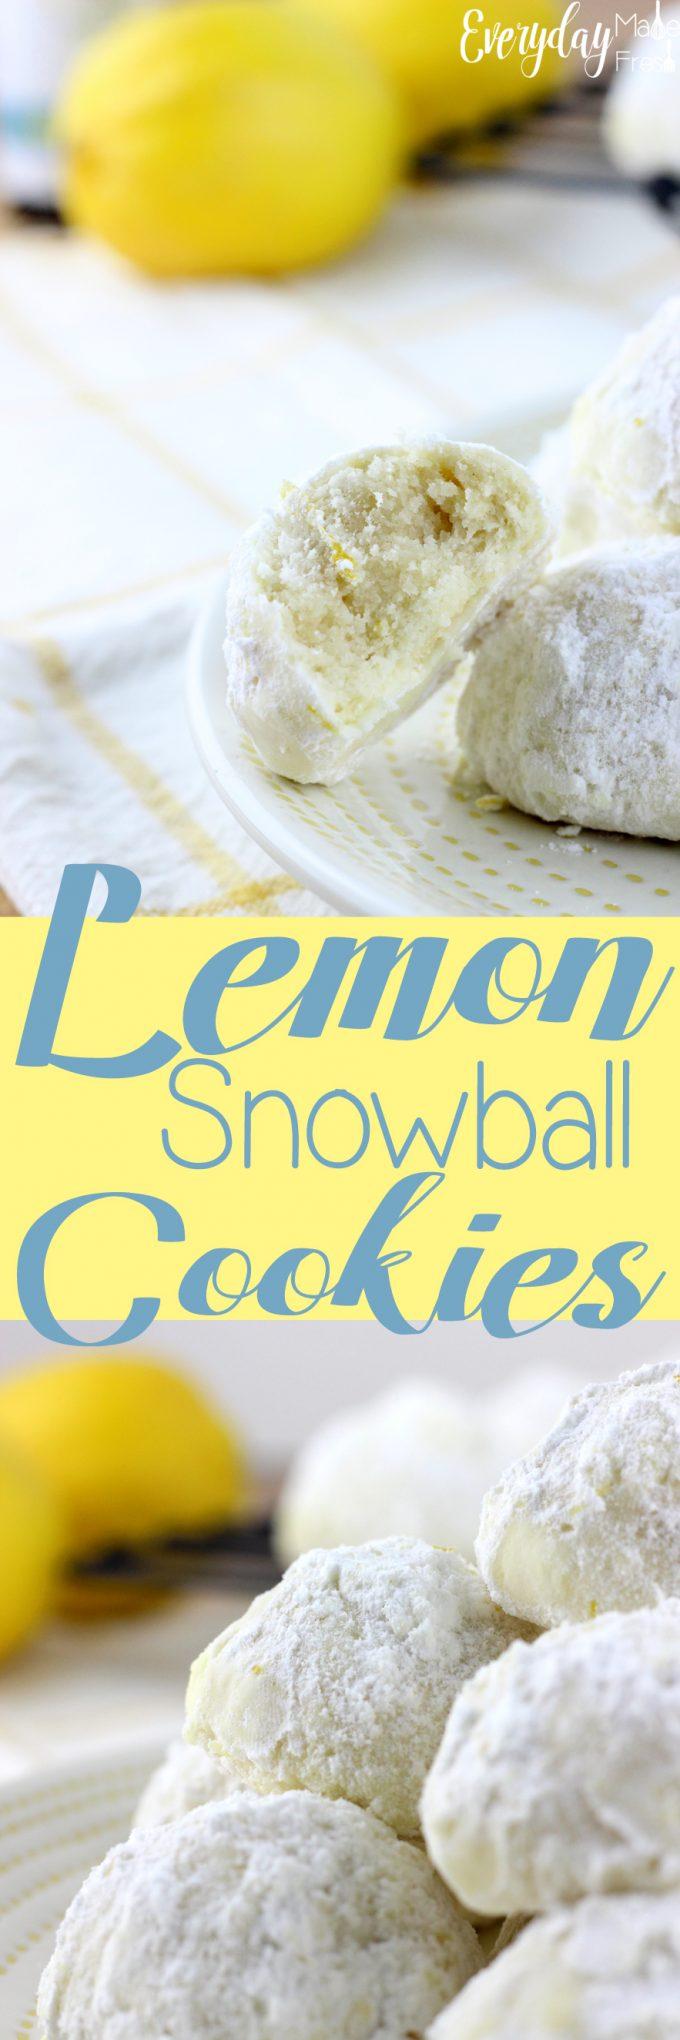 Lemon Snowball Cookies Everyday Made Fresh